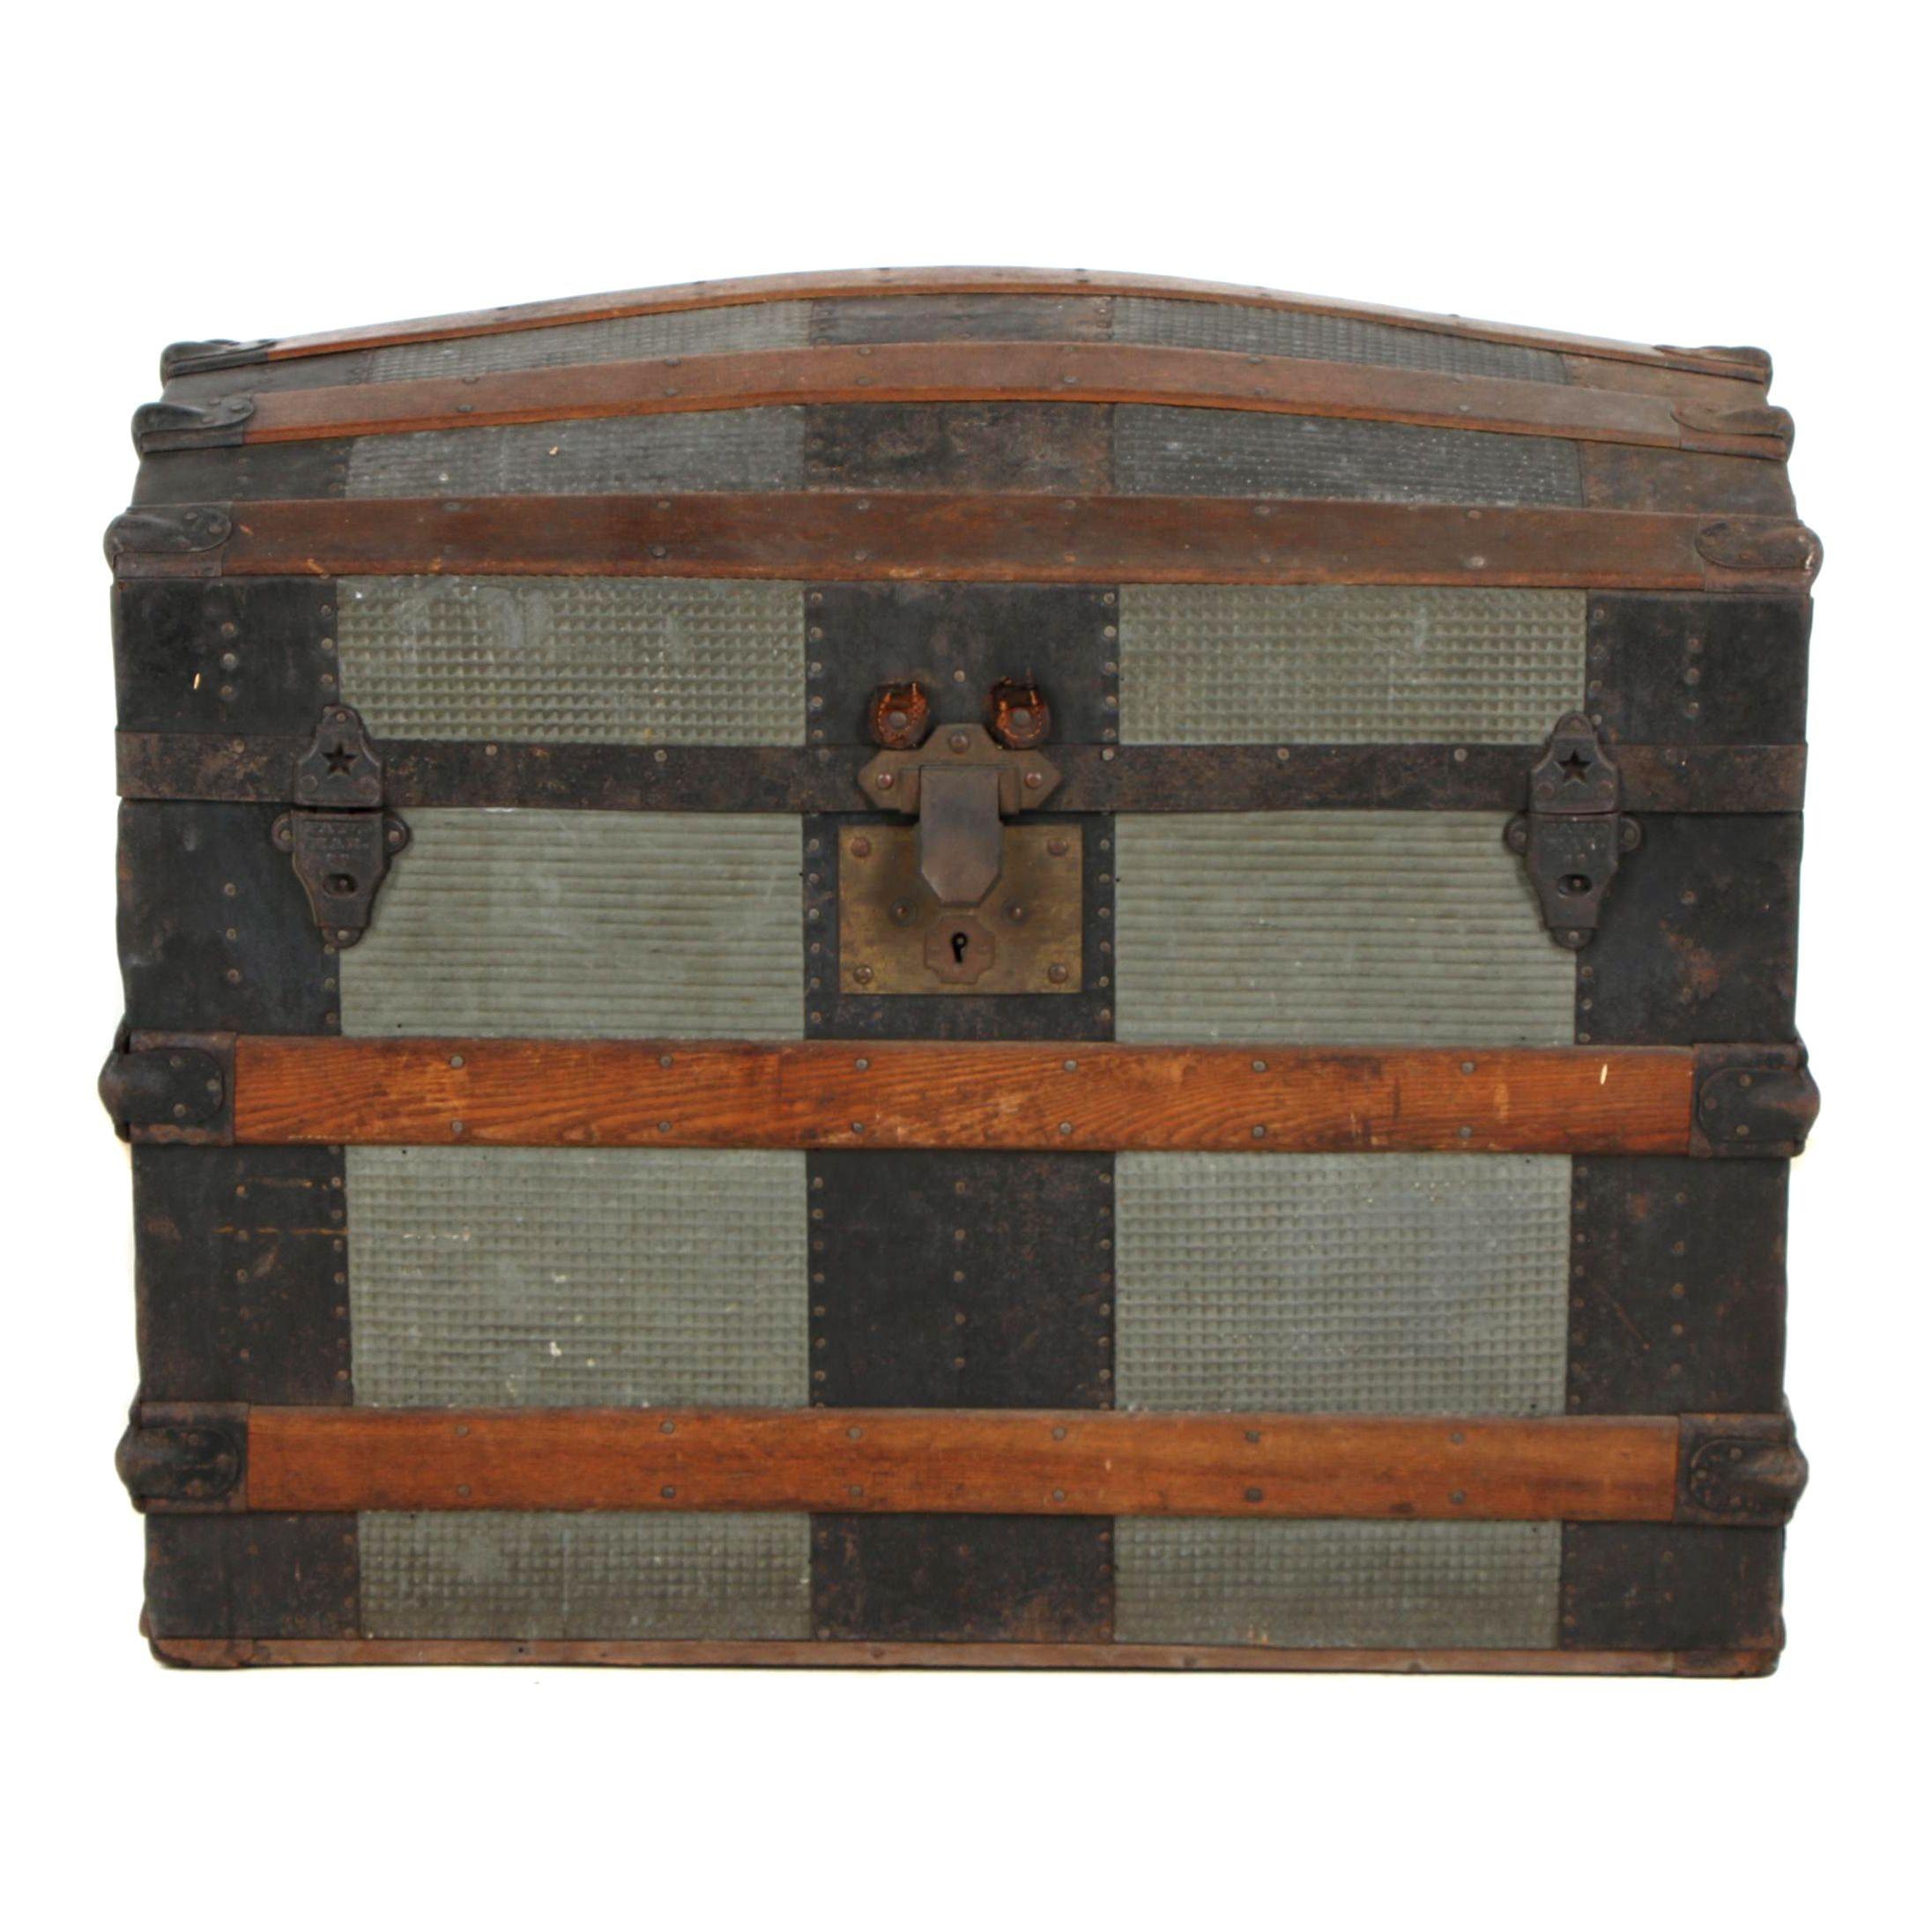 Antique Barrel Top Steamer Trunk